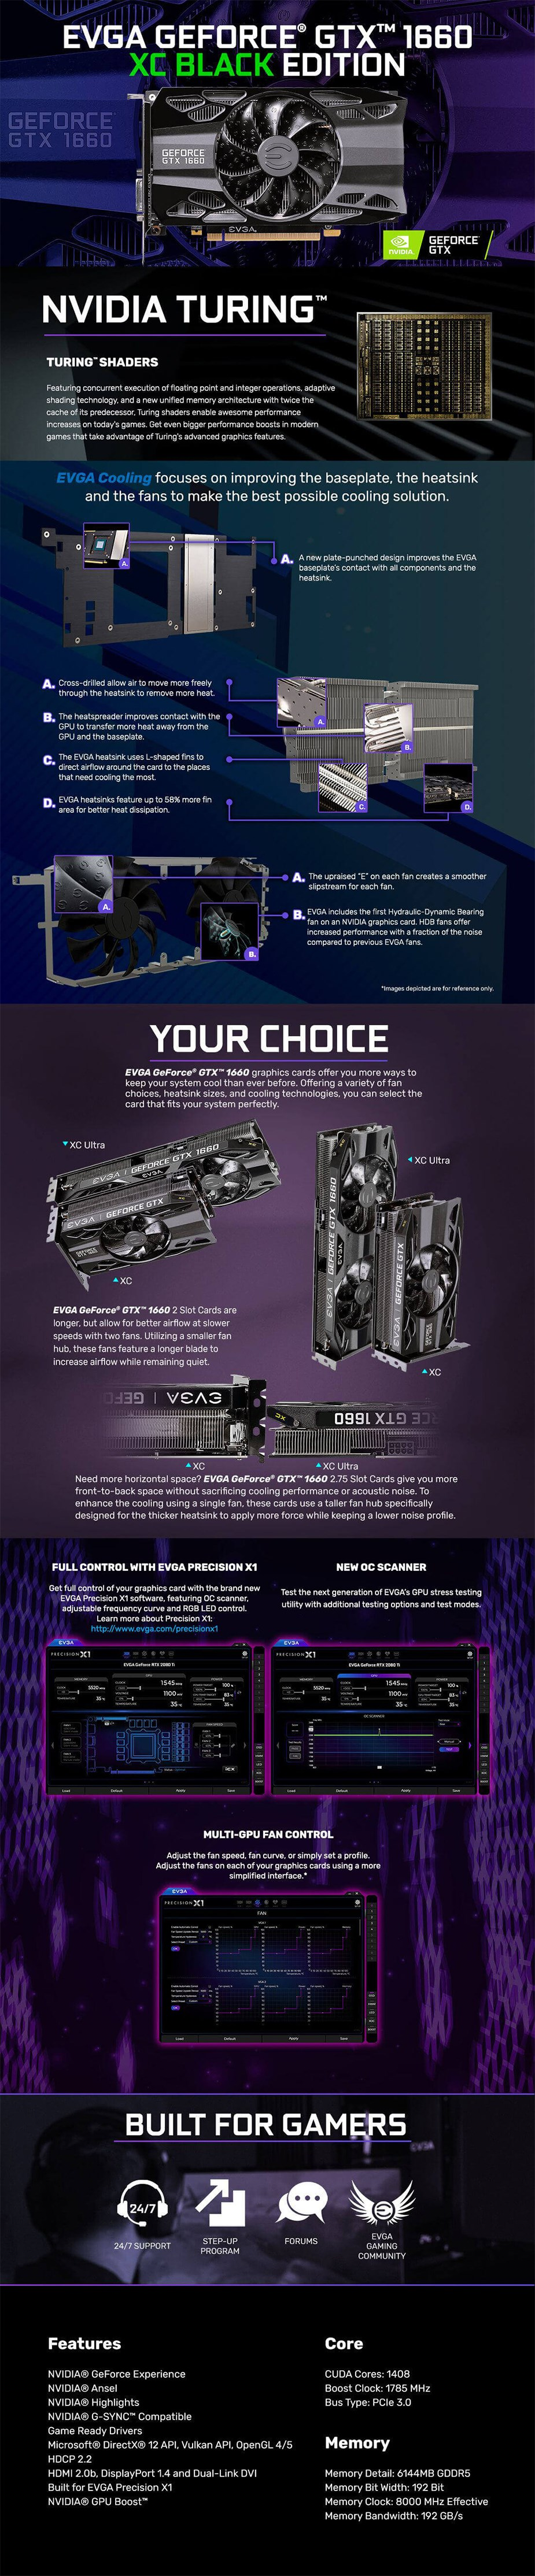 EVGA GeForce GTX 1660 XC BLACK GAMING 6GB Video Card - Desktop Overview 1